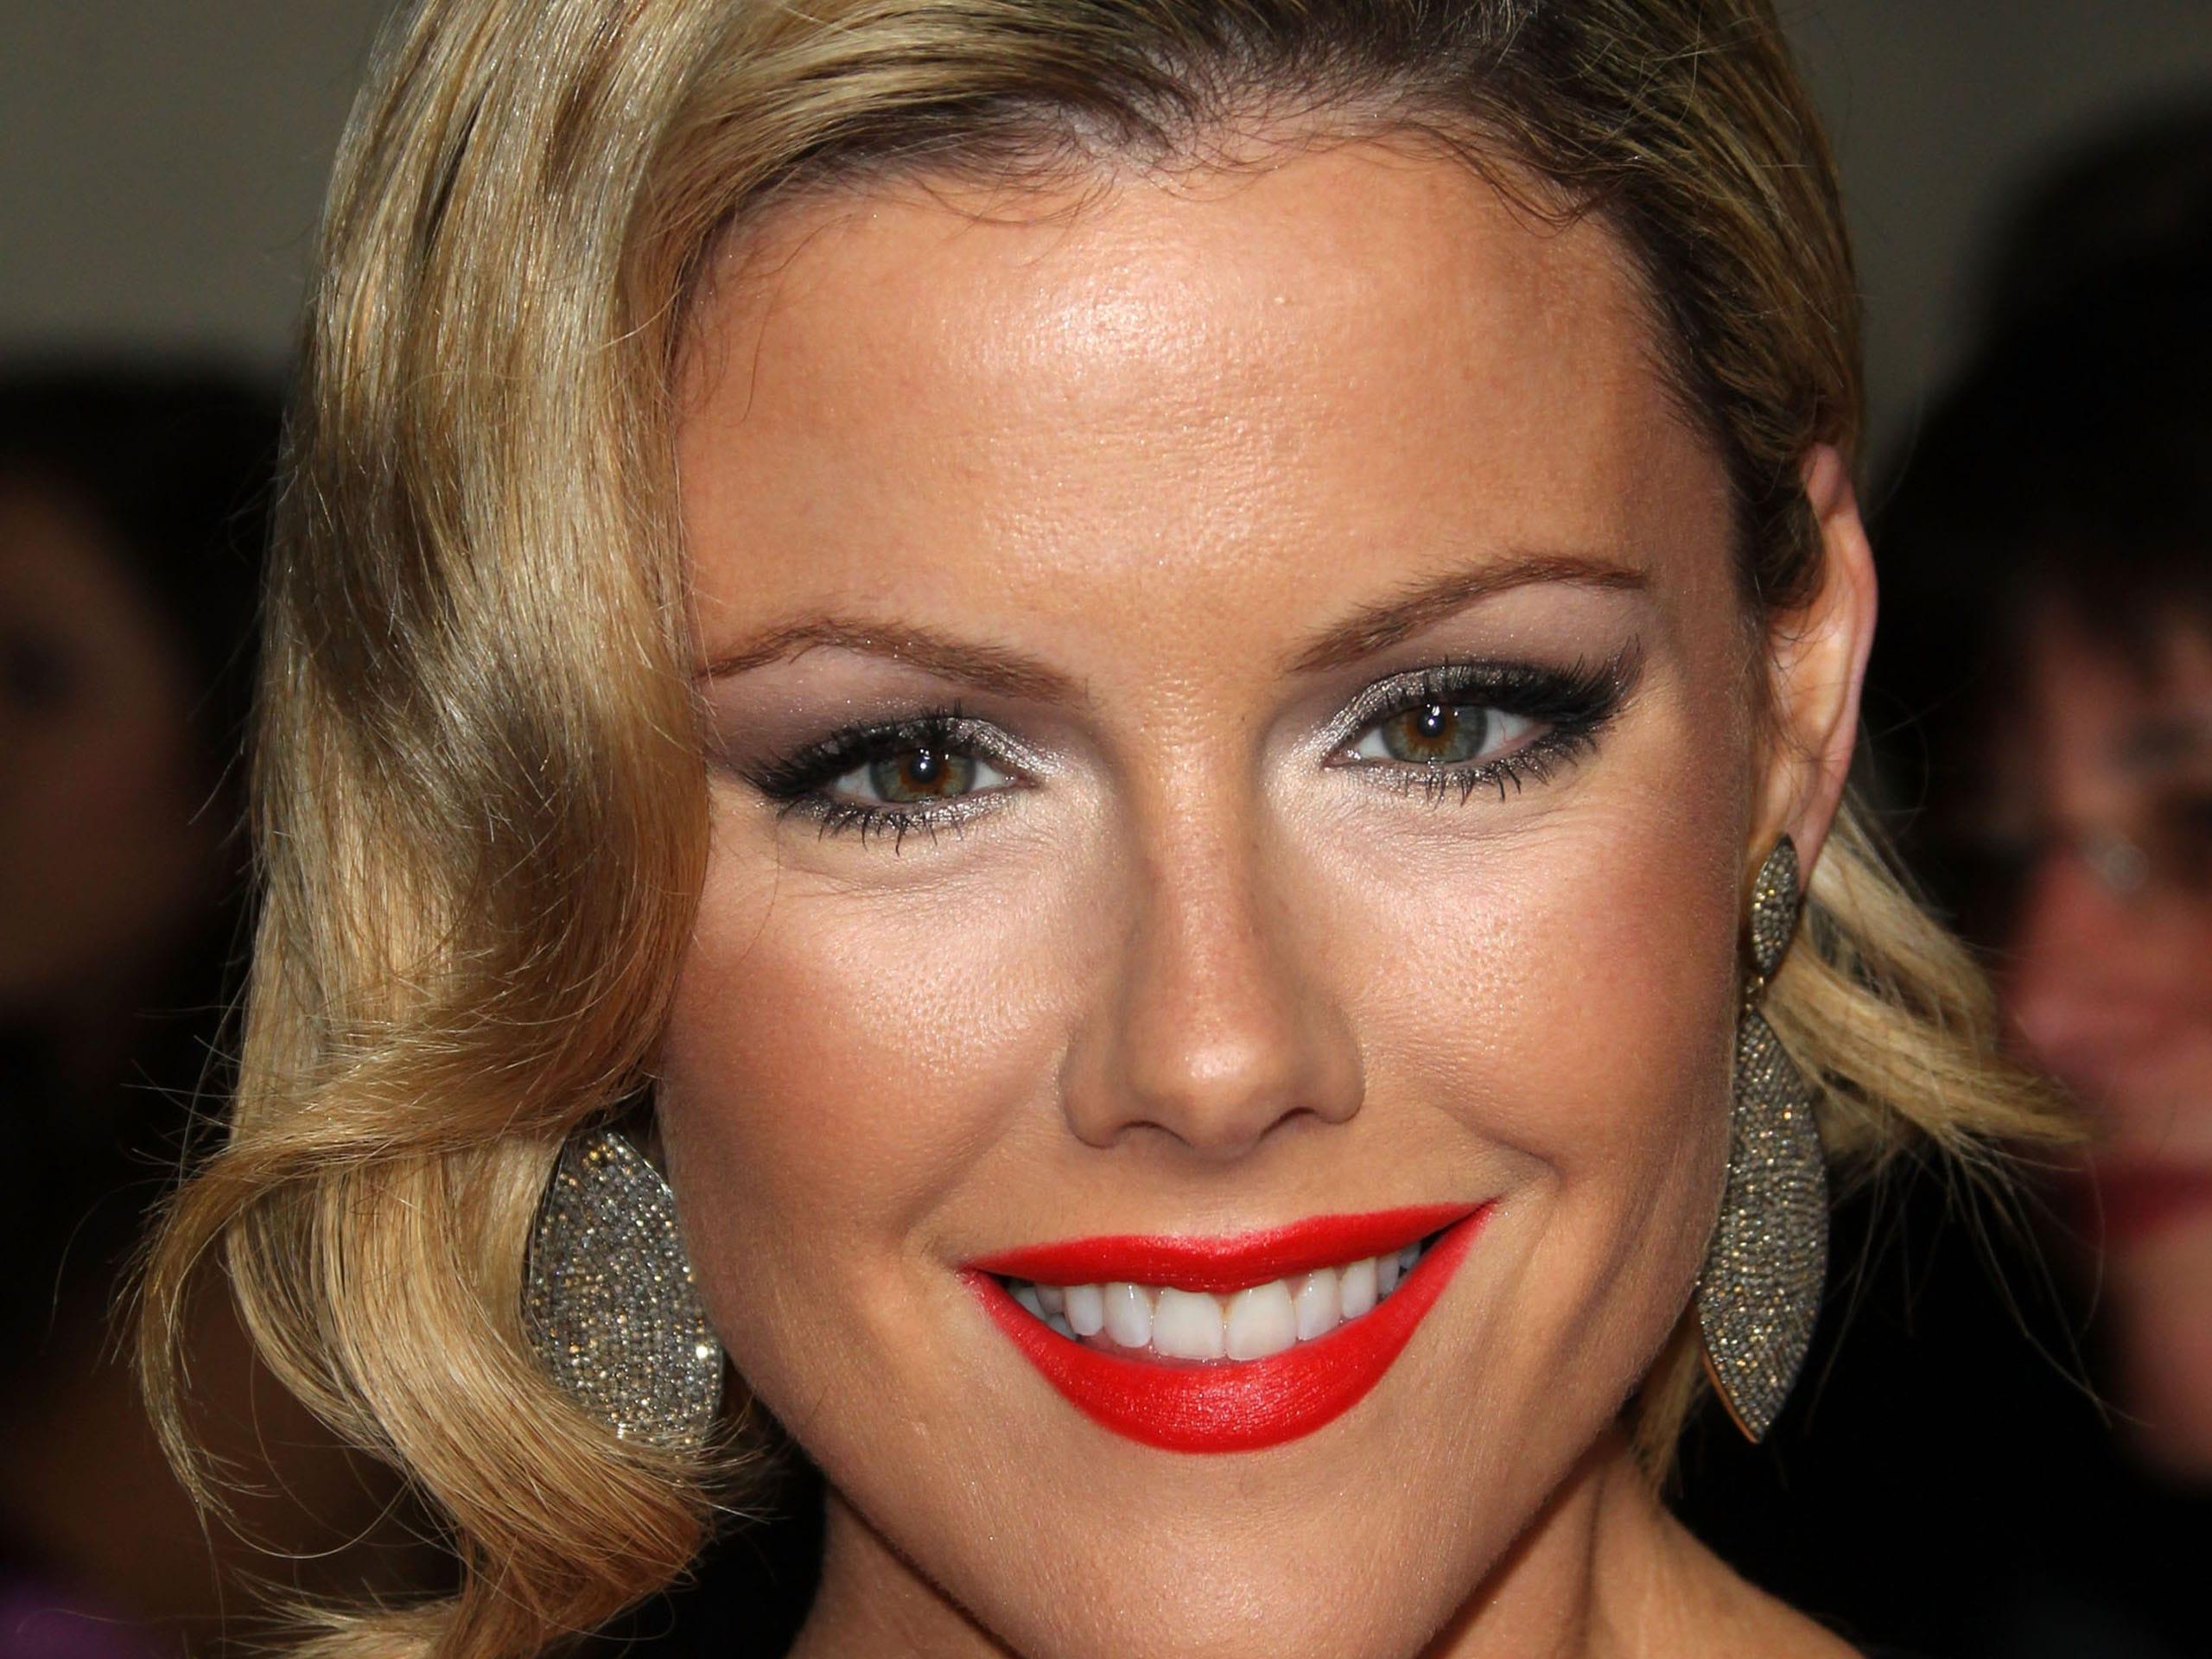 kathleen robertson face makeup wallpaper 60644